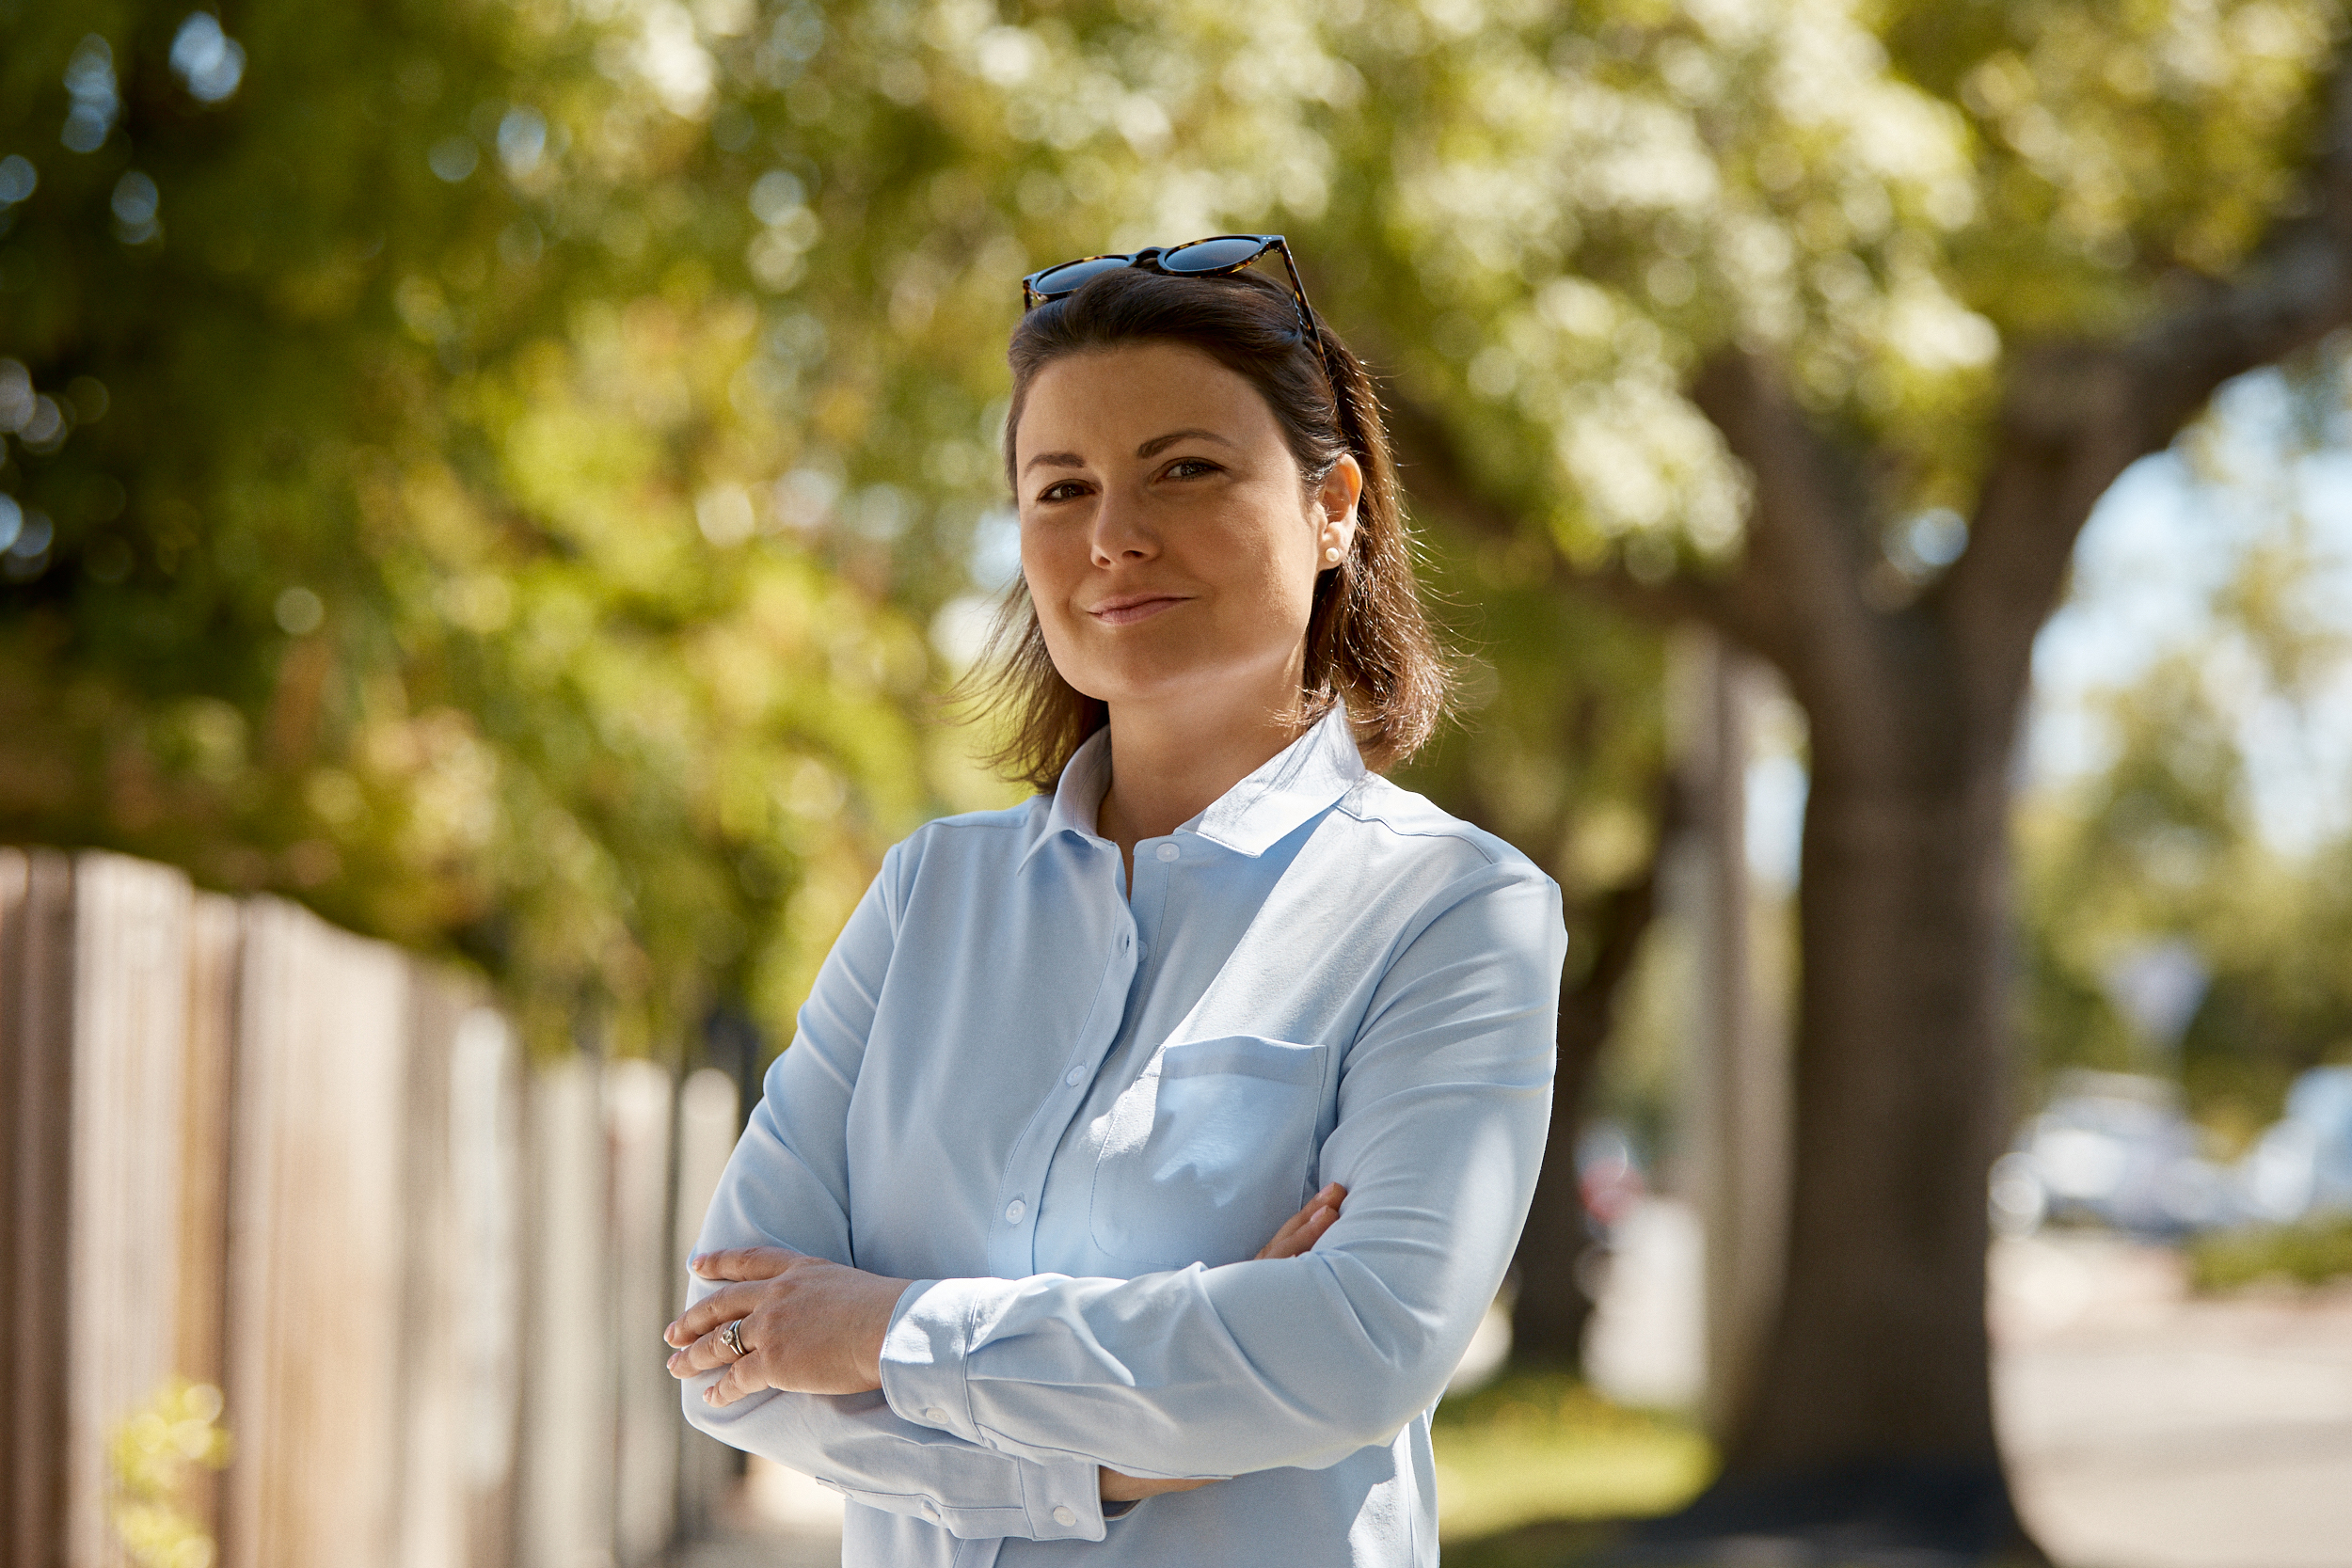 Onyapreneur:Johanna Young, Founder of SOLBARI